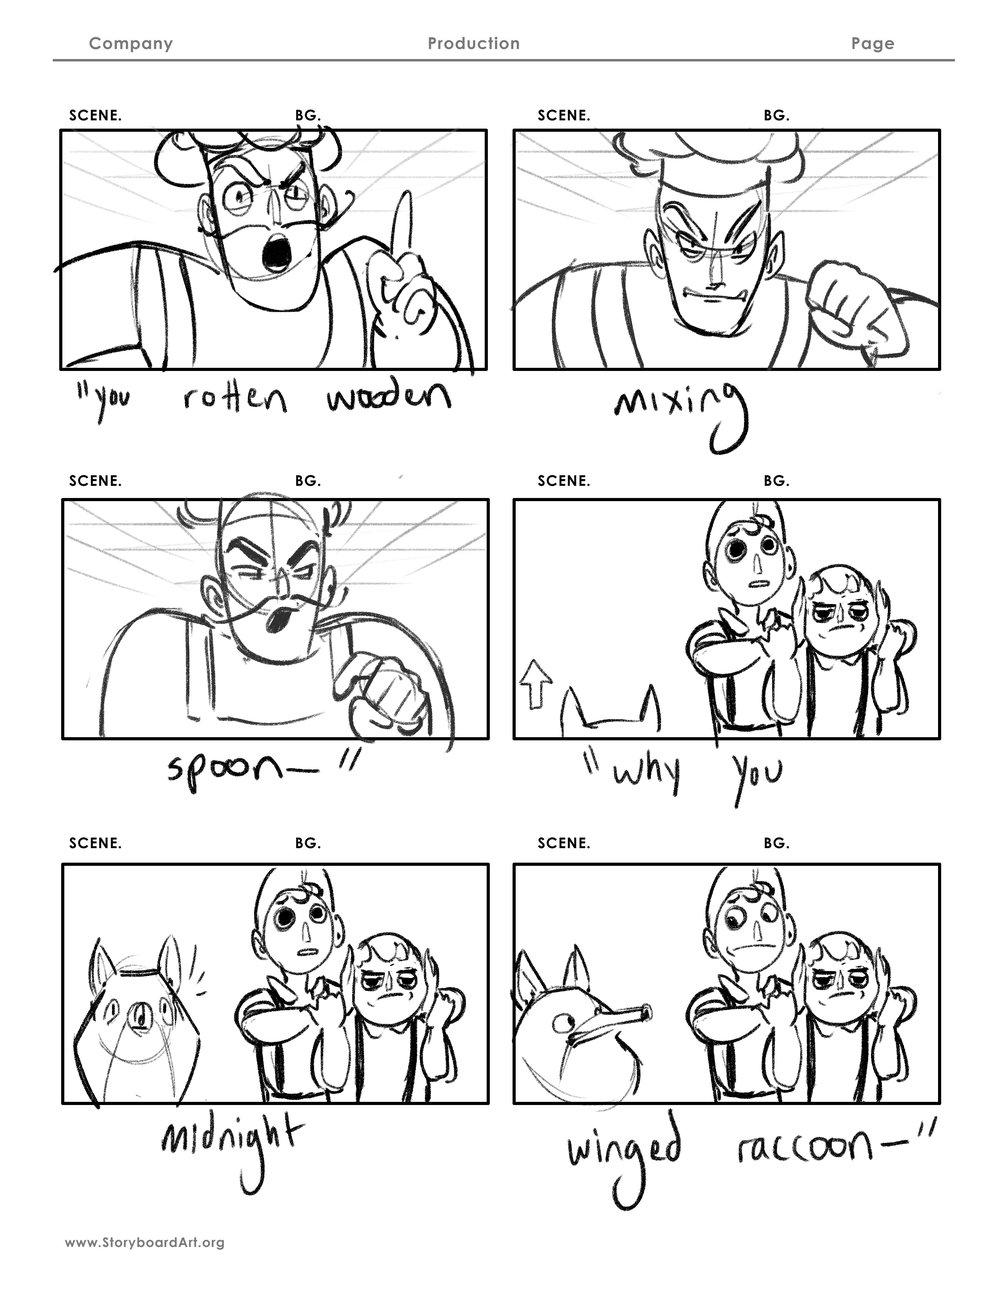 james storyboards page 14.jpg